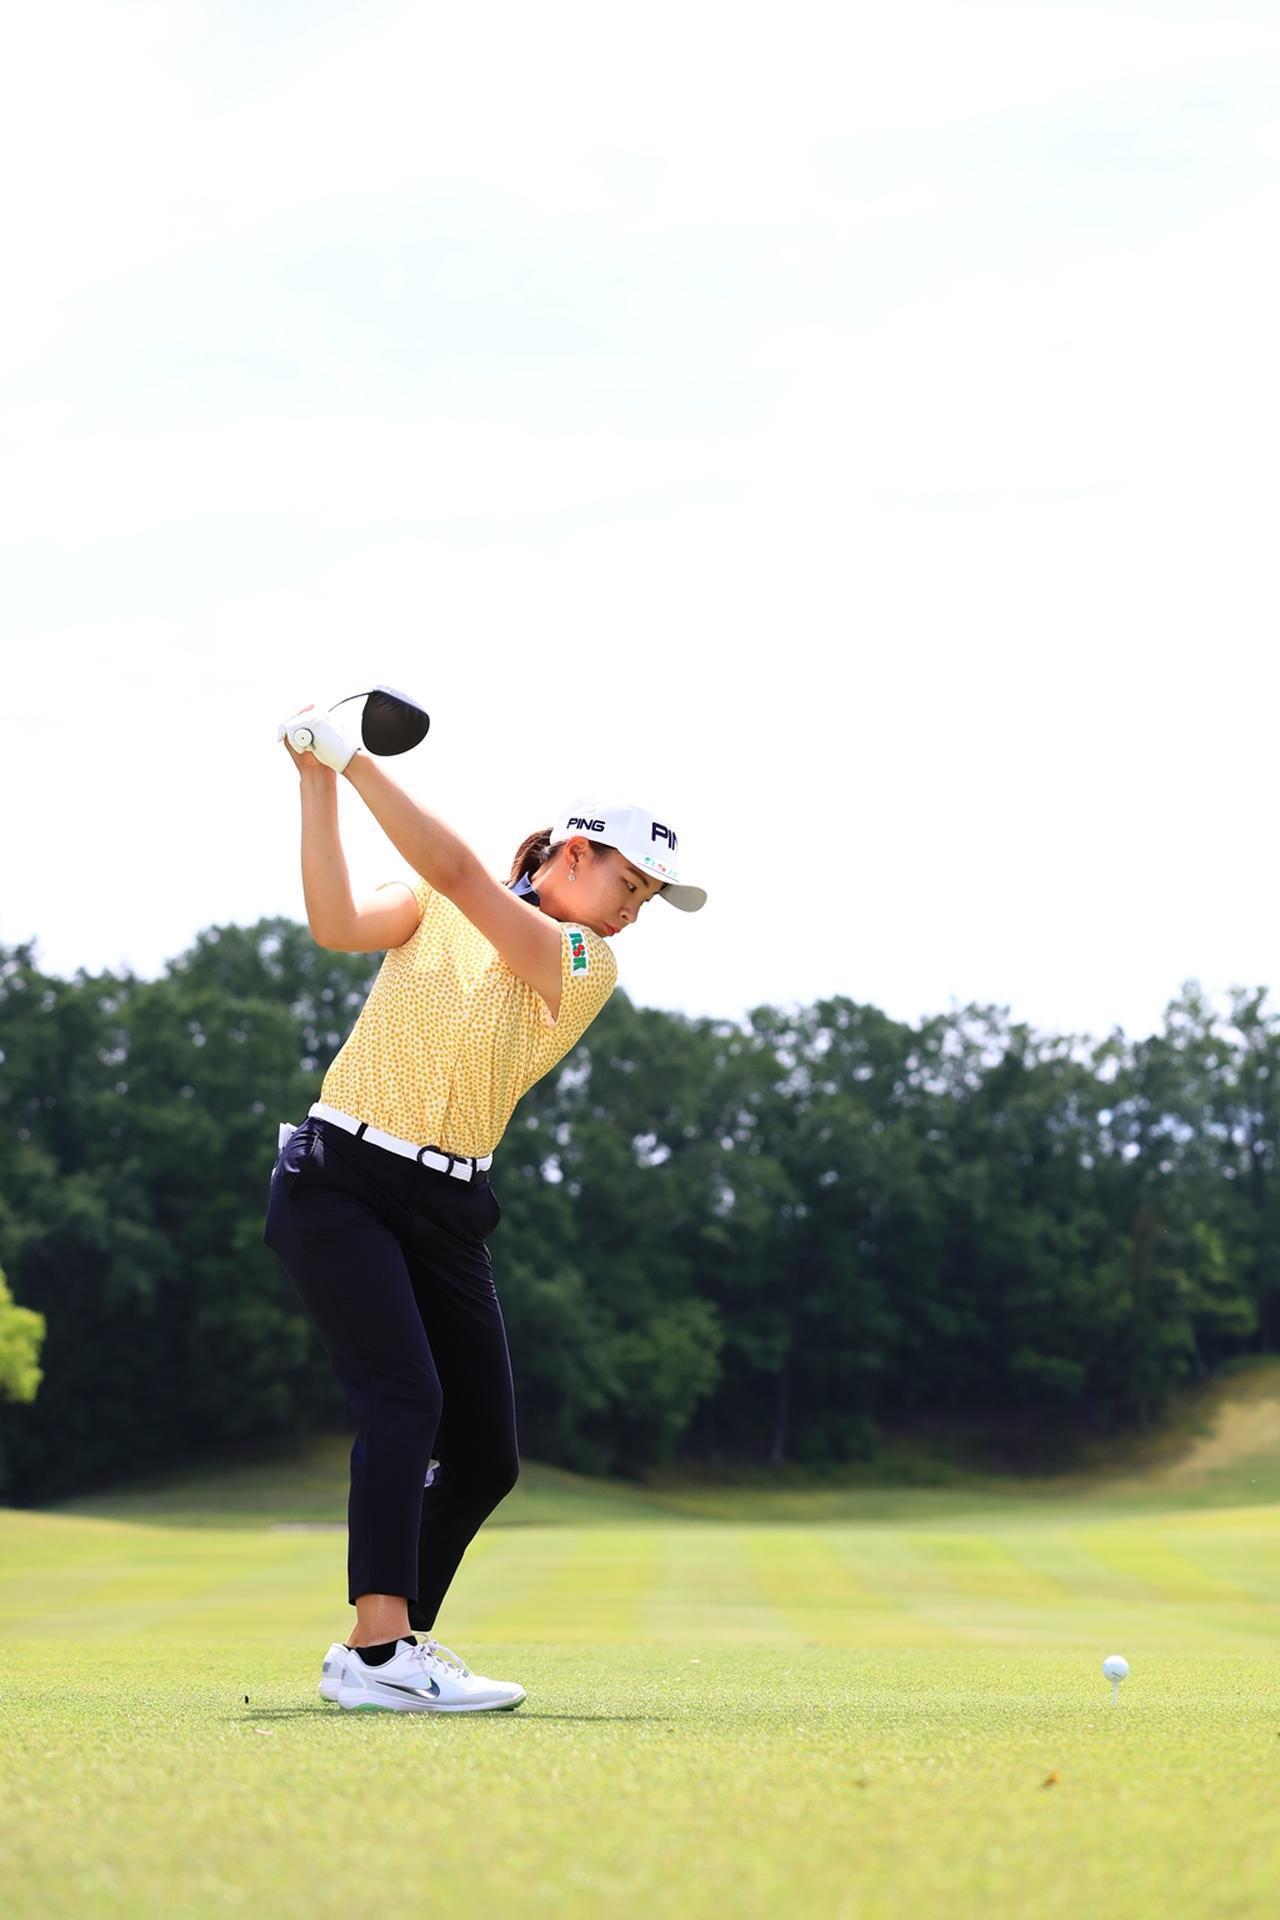 Images : 9番目の画像 - 渋野日向子のドライバー後方連続写真 - みんなのゴルフダイジェスト